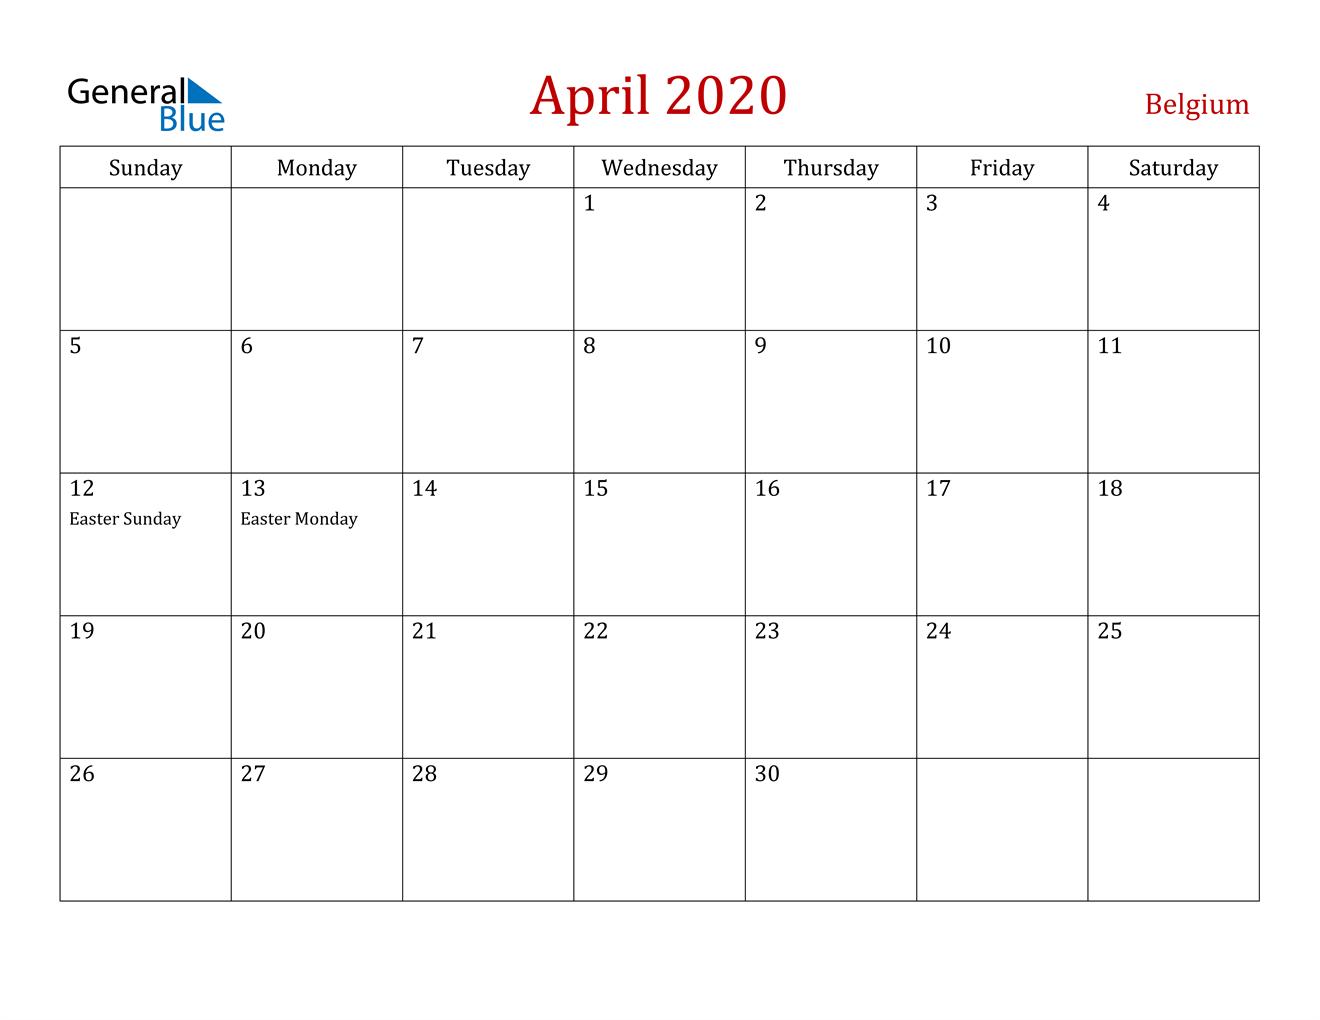 Image of April 2020 Dark and Red Professional Office Calendar Calendar